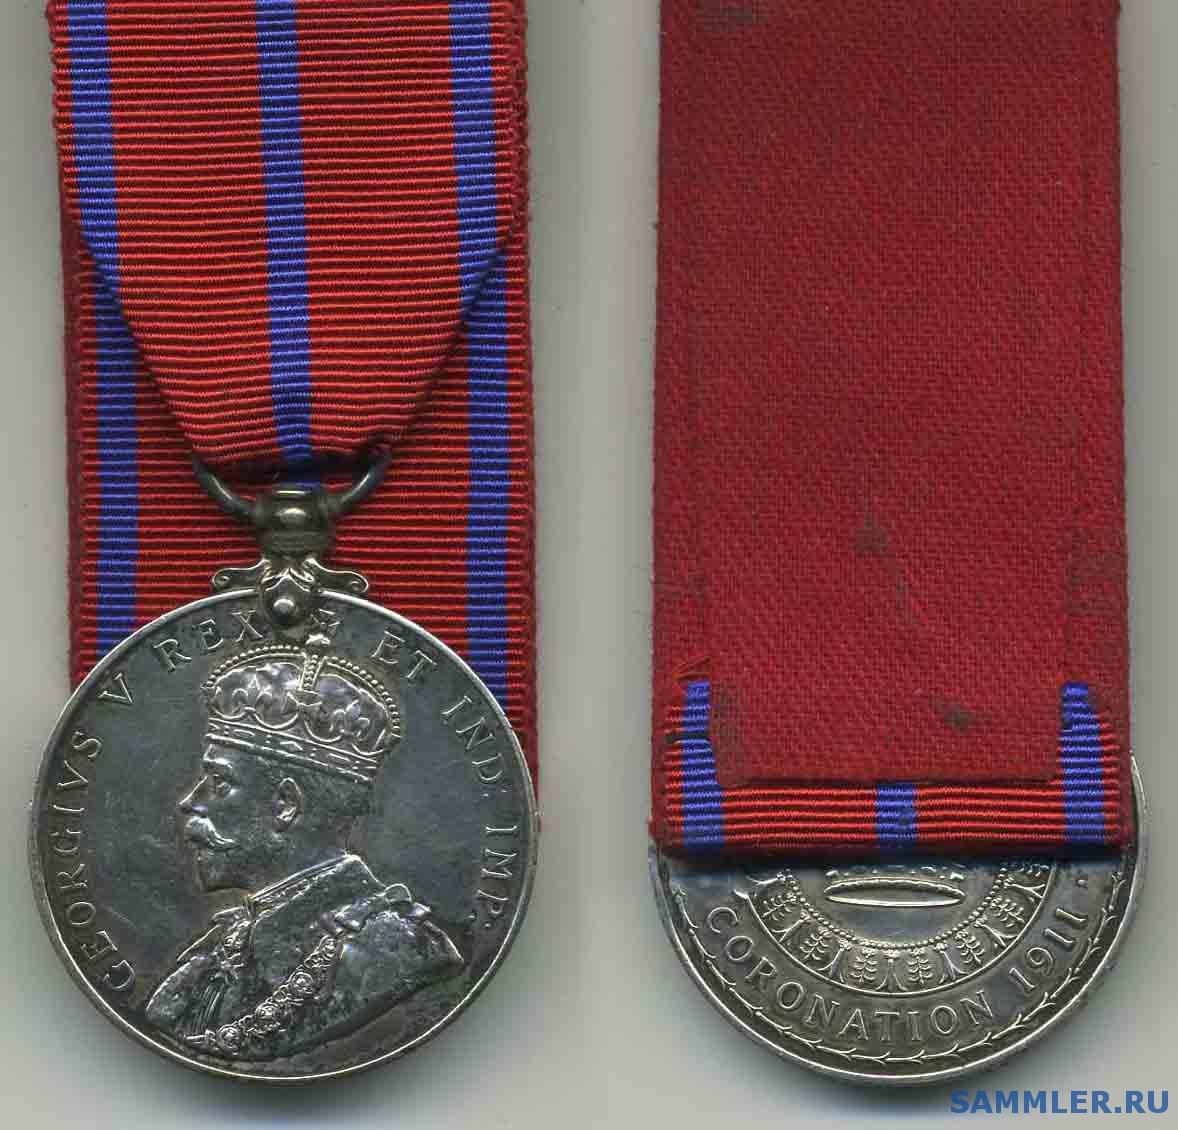 Coronation_1911_Metropolitan_Police.jpg